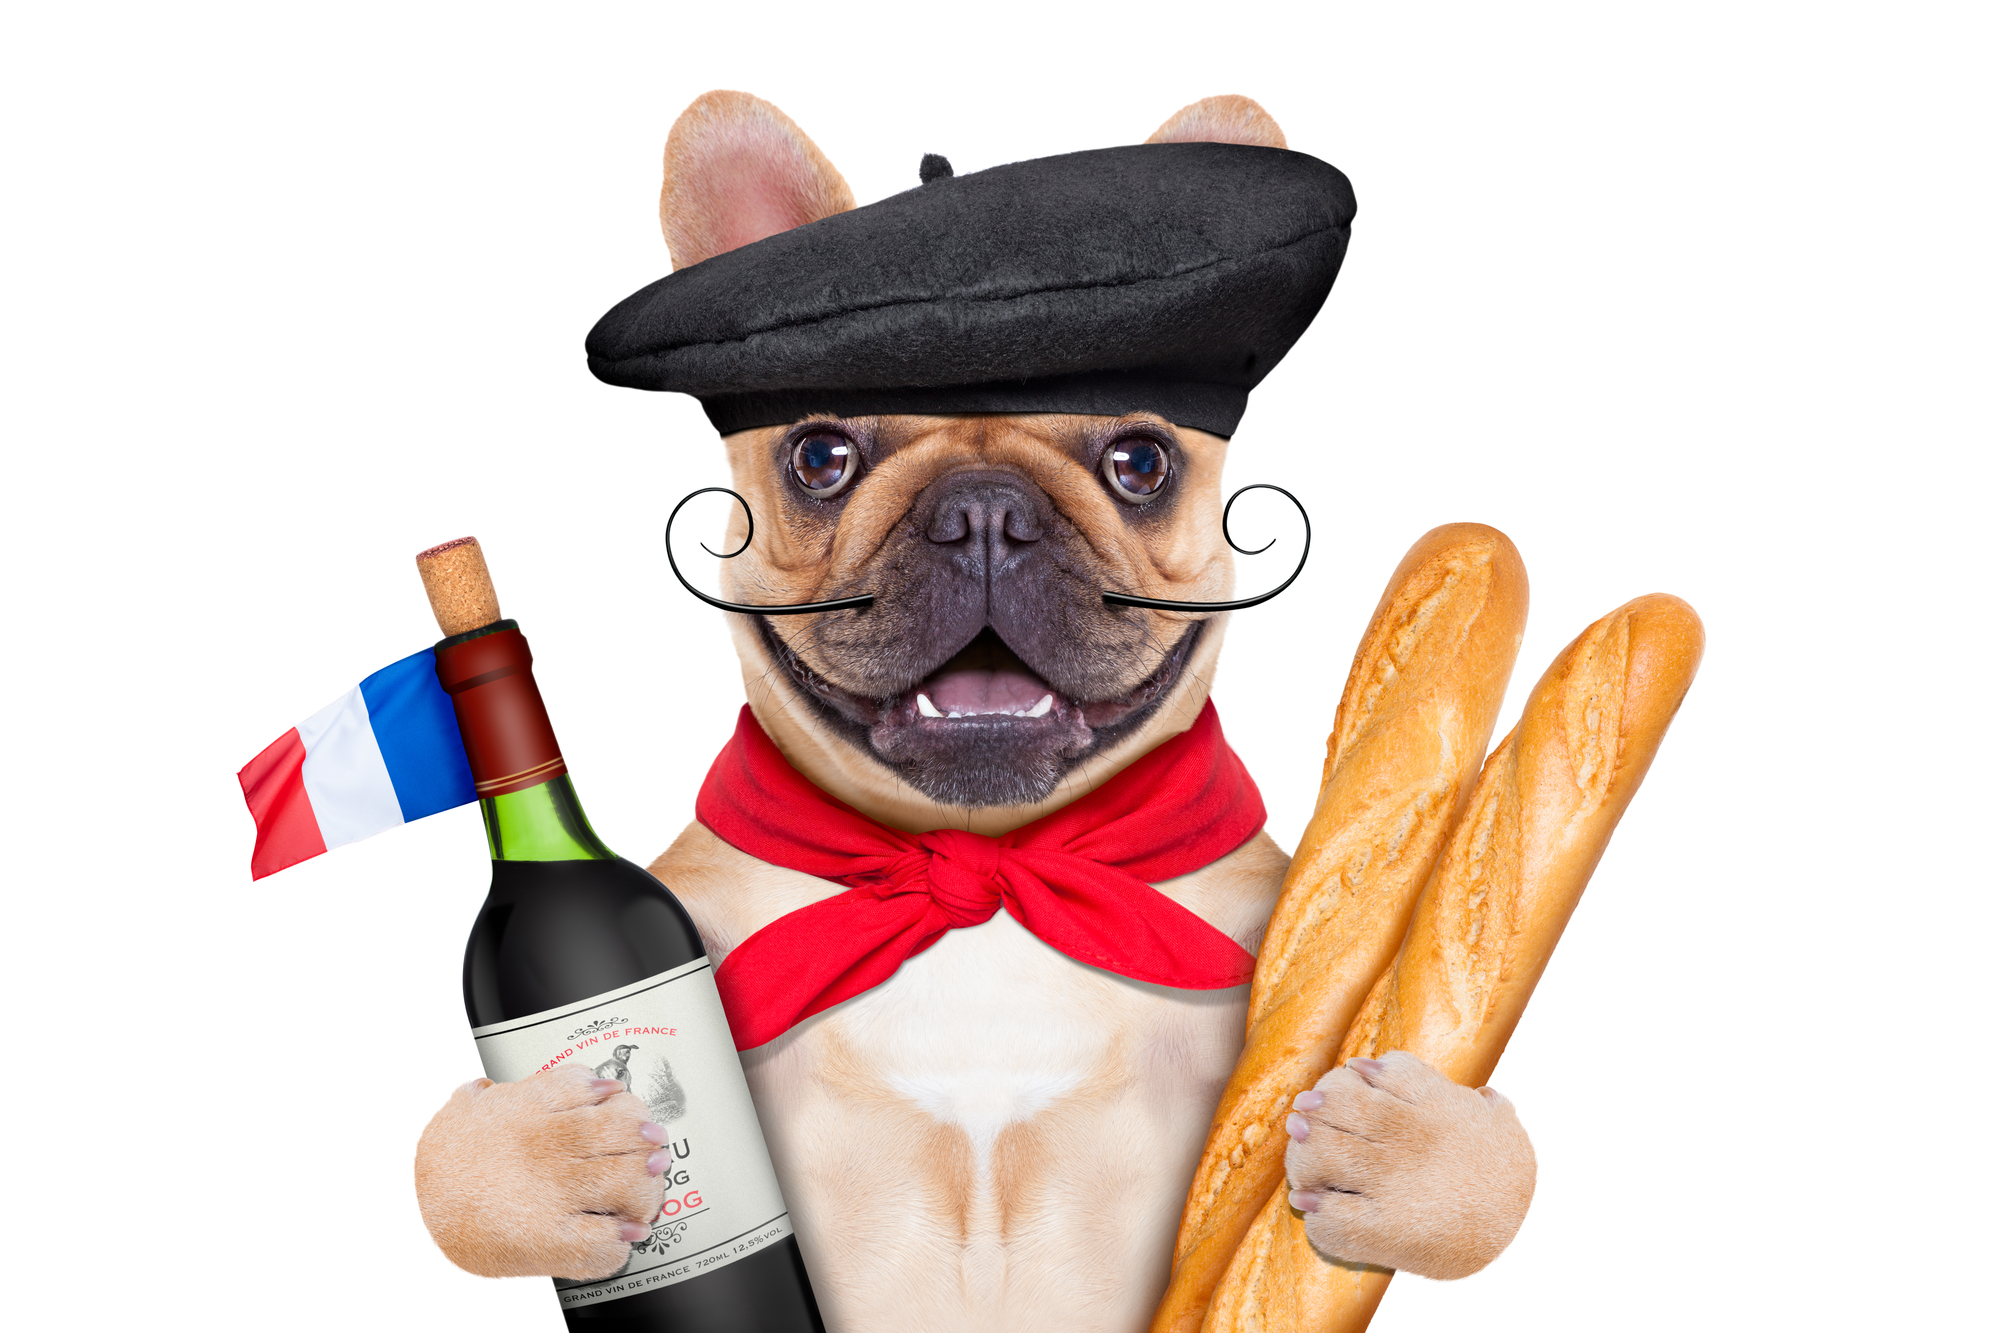 French Vegan Humor